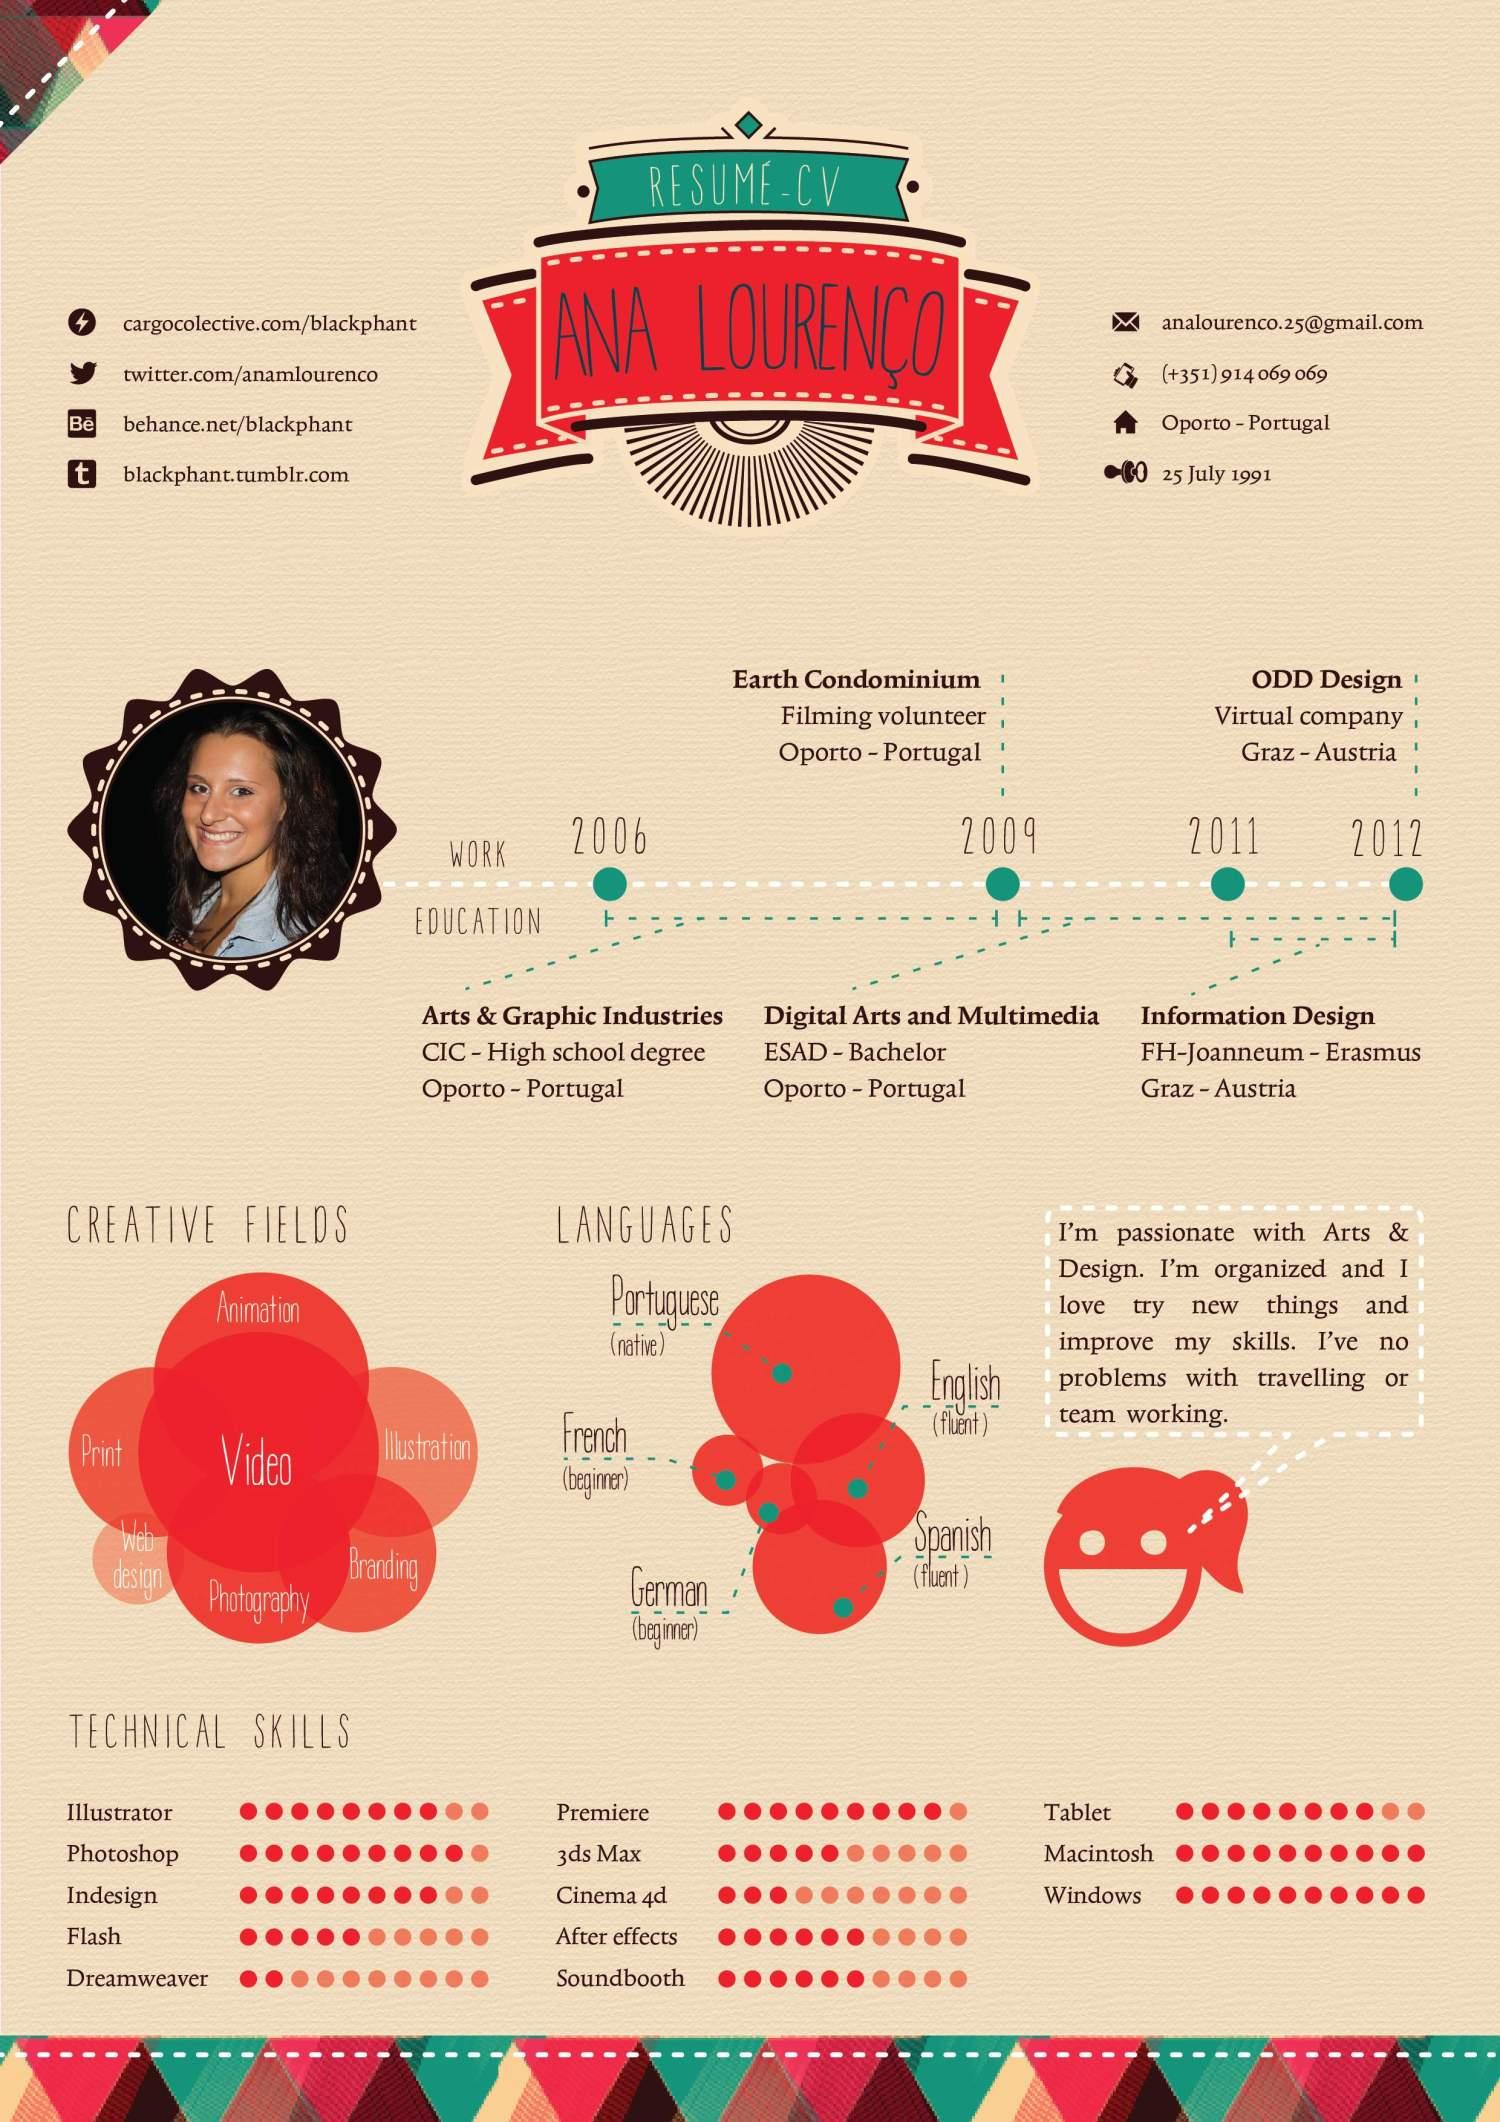 Infographic cv Ana Louren